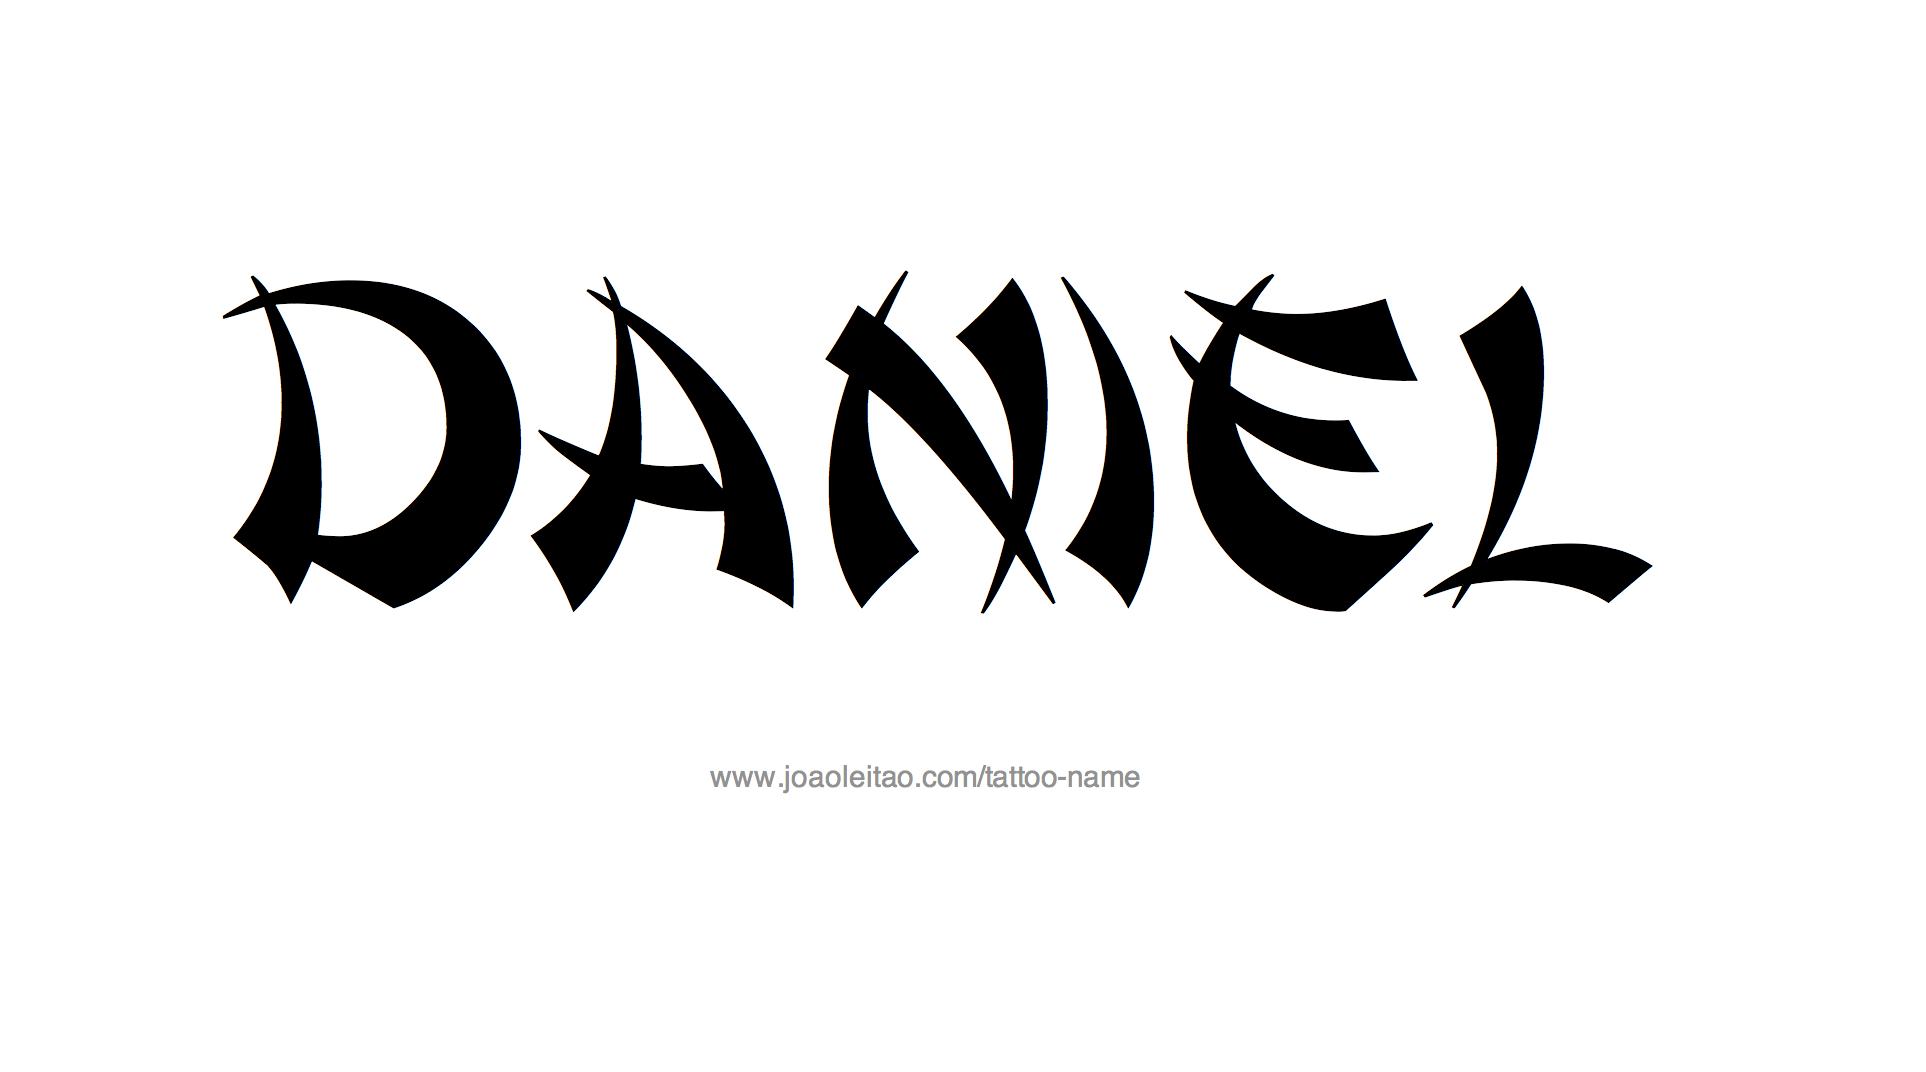 daniel name images galleries with a bite. Black Bedroom Furniture Sets. Home Design Ideas